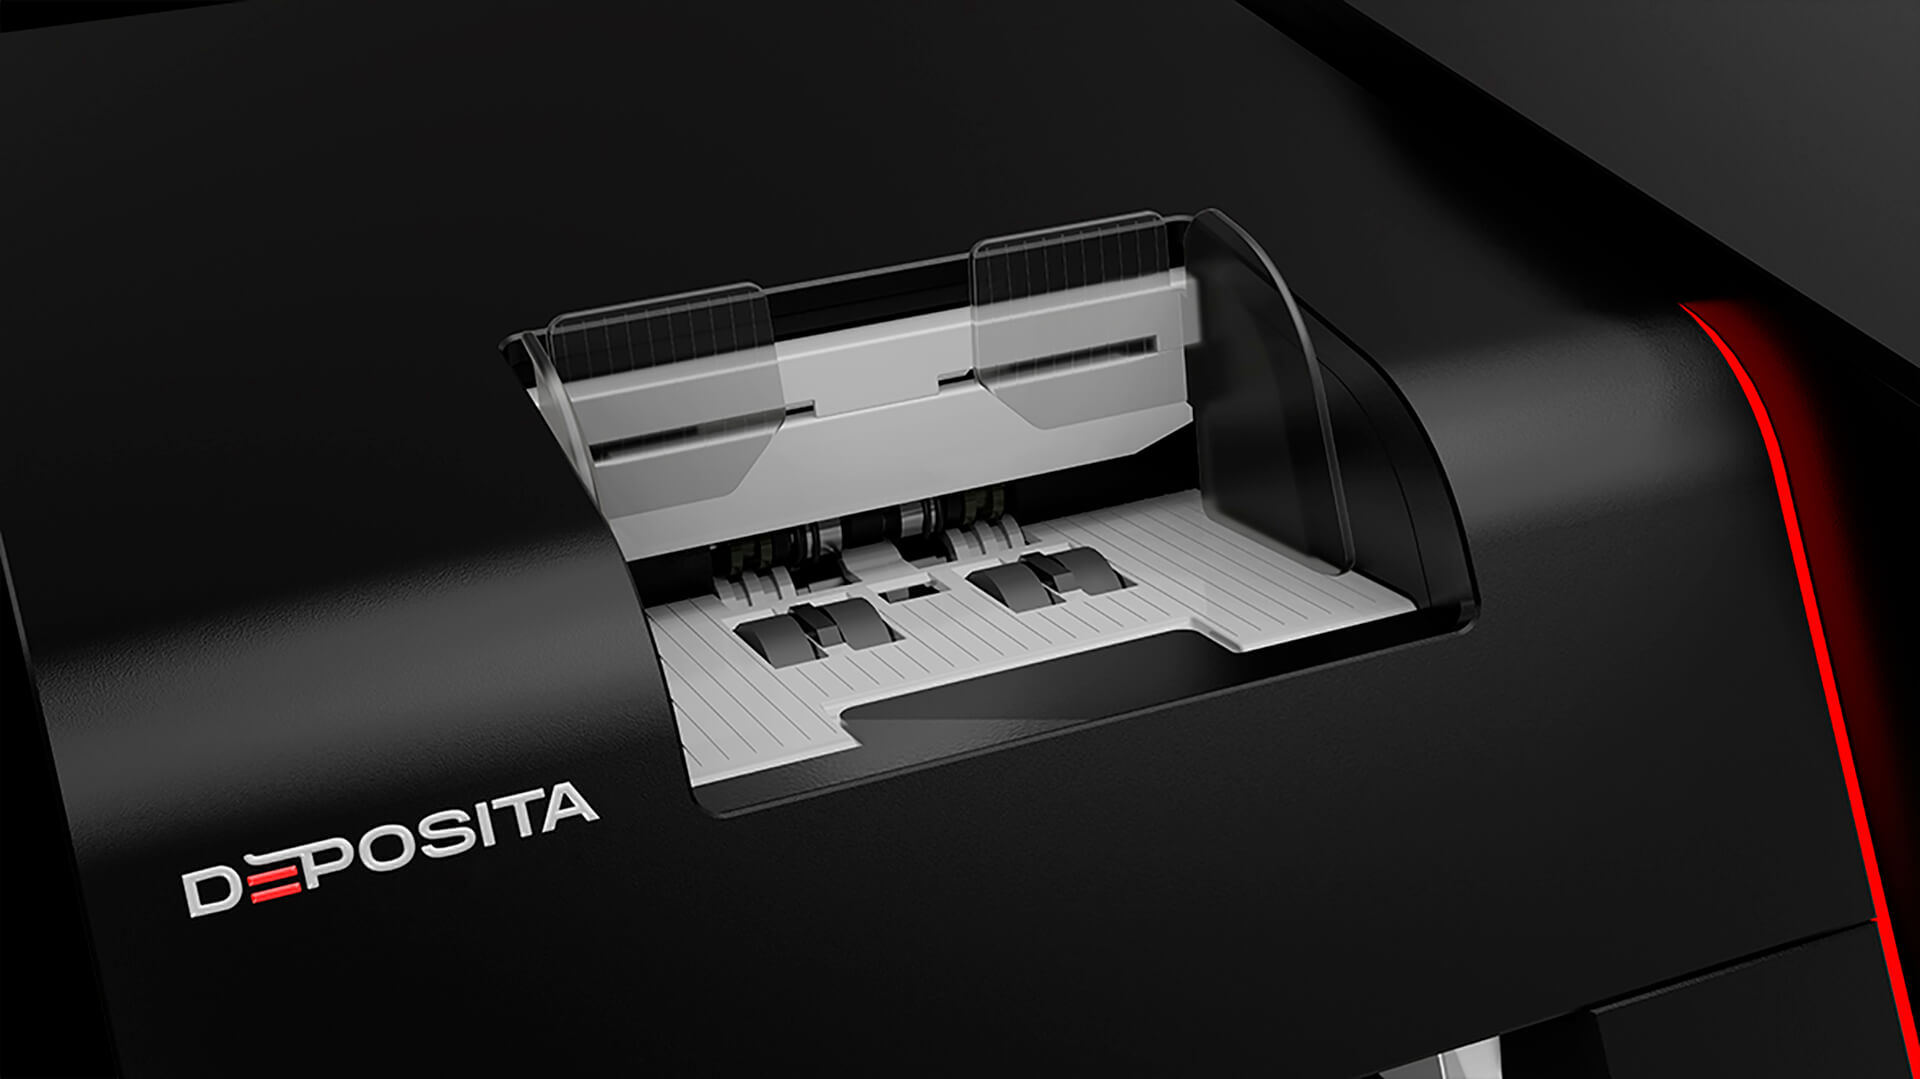 new-deposita-products 3